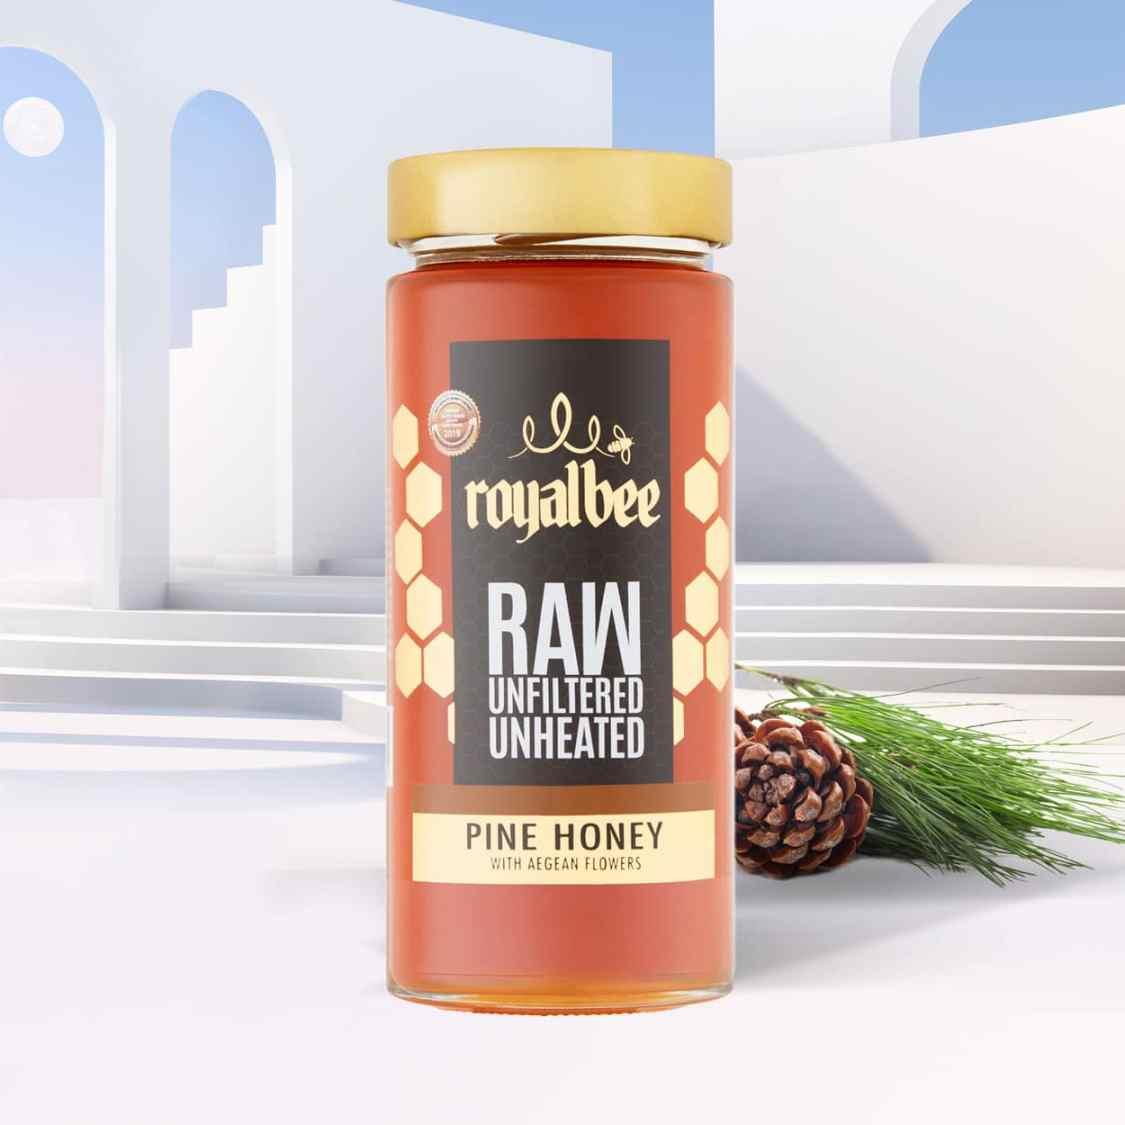 royal-bee-pine-honey